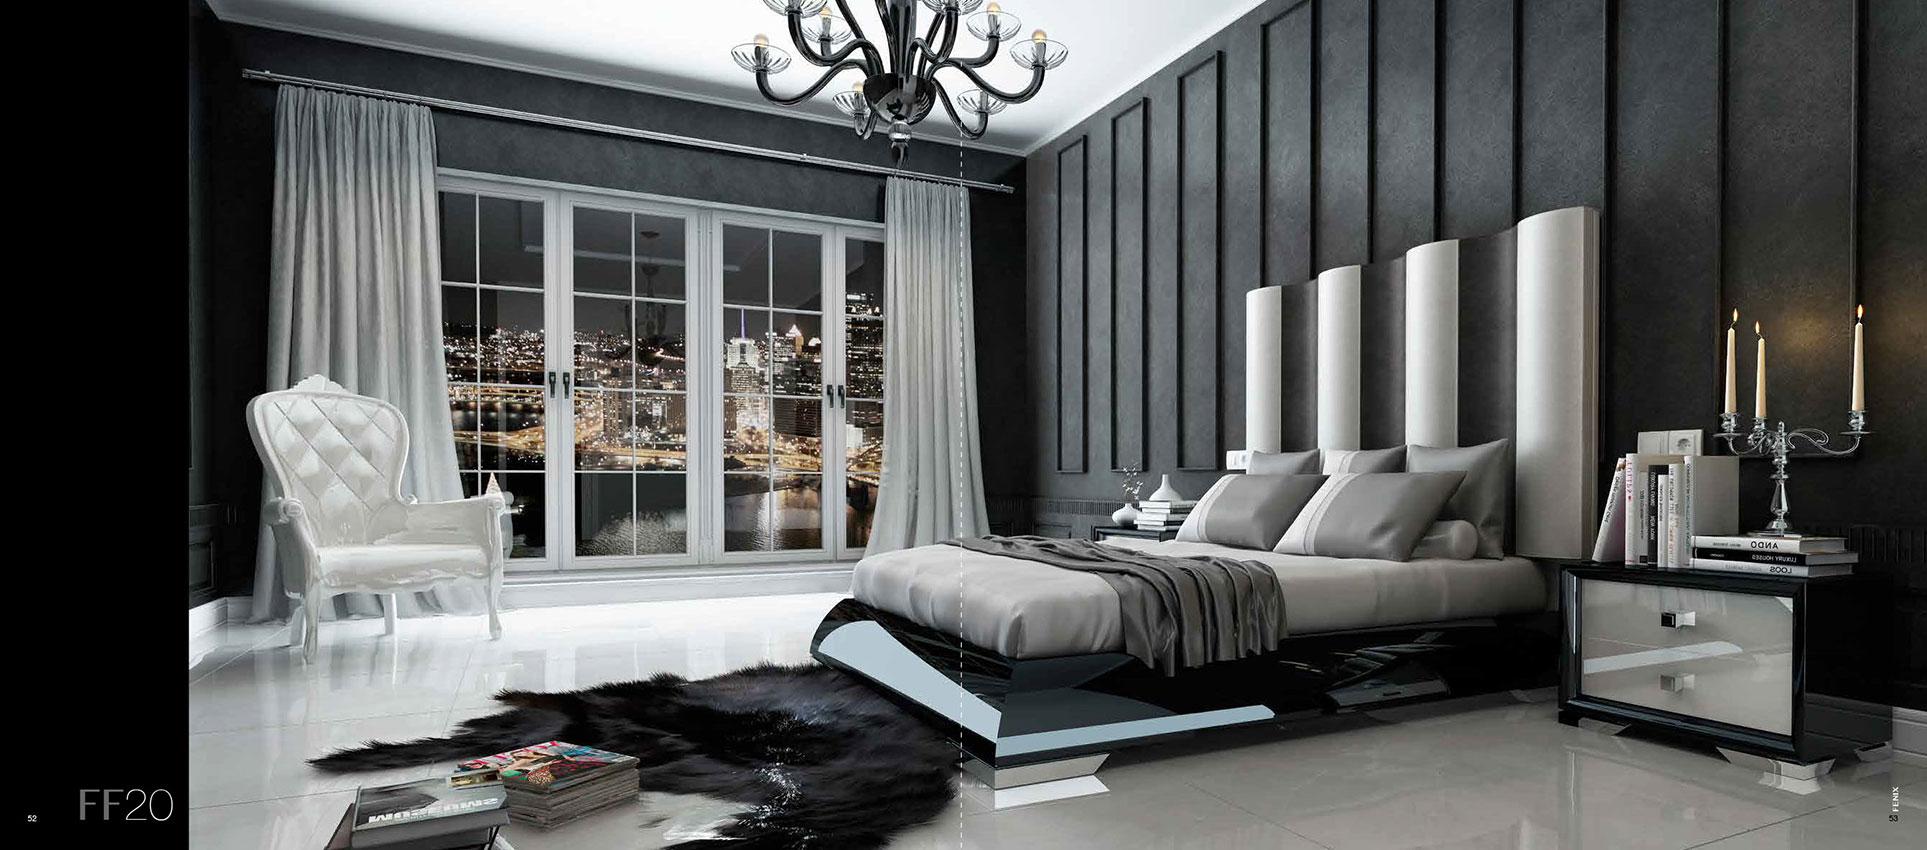 Franco-Furniture-Fenix-FF20-Bedroom-Collection-Br-57-1